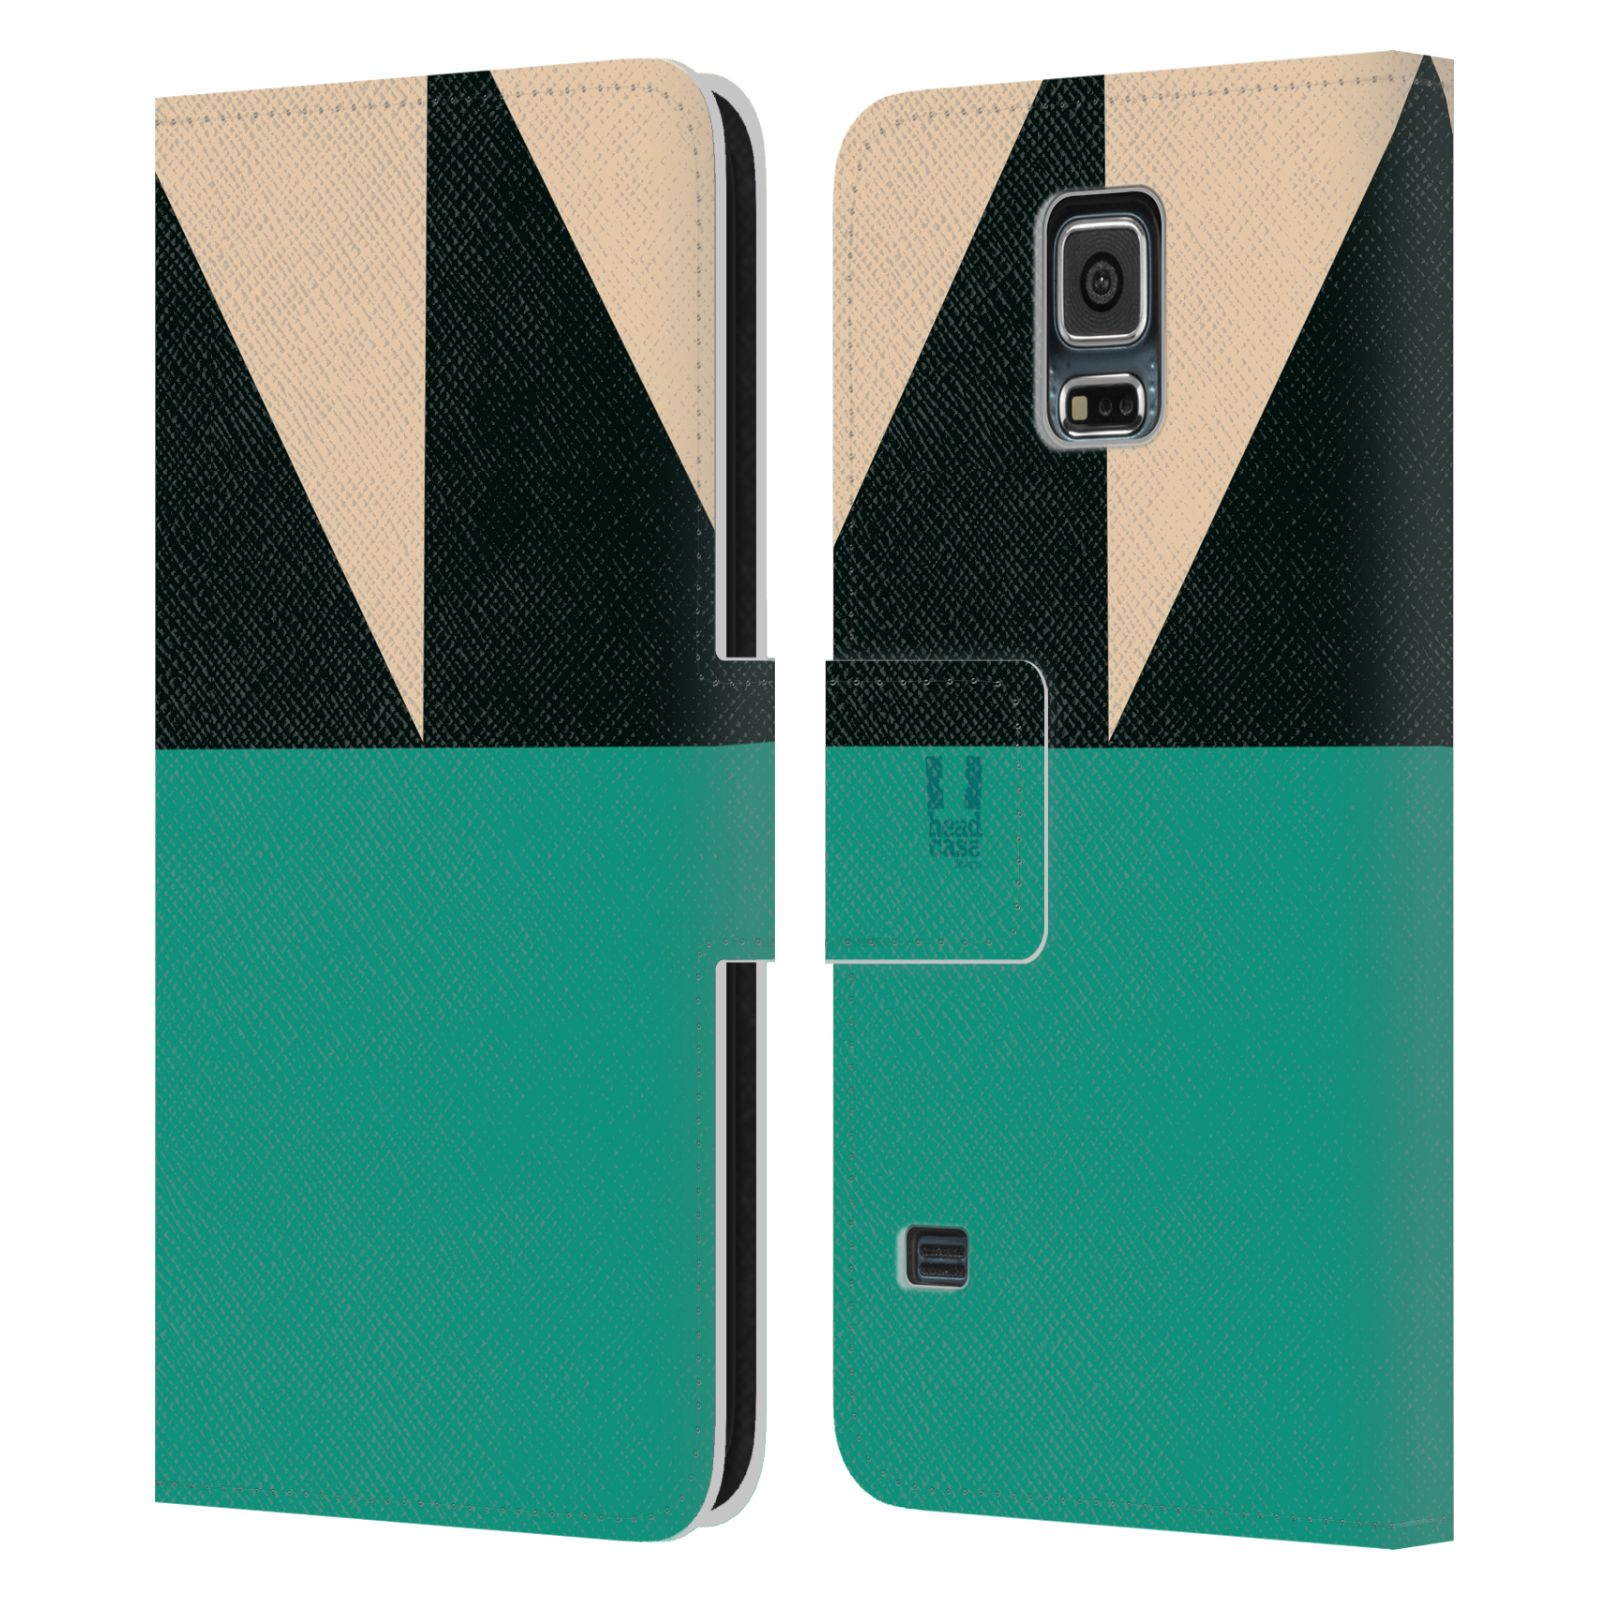 HEAD CASE Flipové pouzdro pro mobil Samsung Galaxy S5 barevné tvary moře modrá